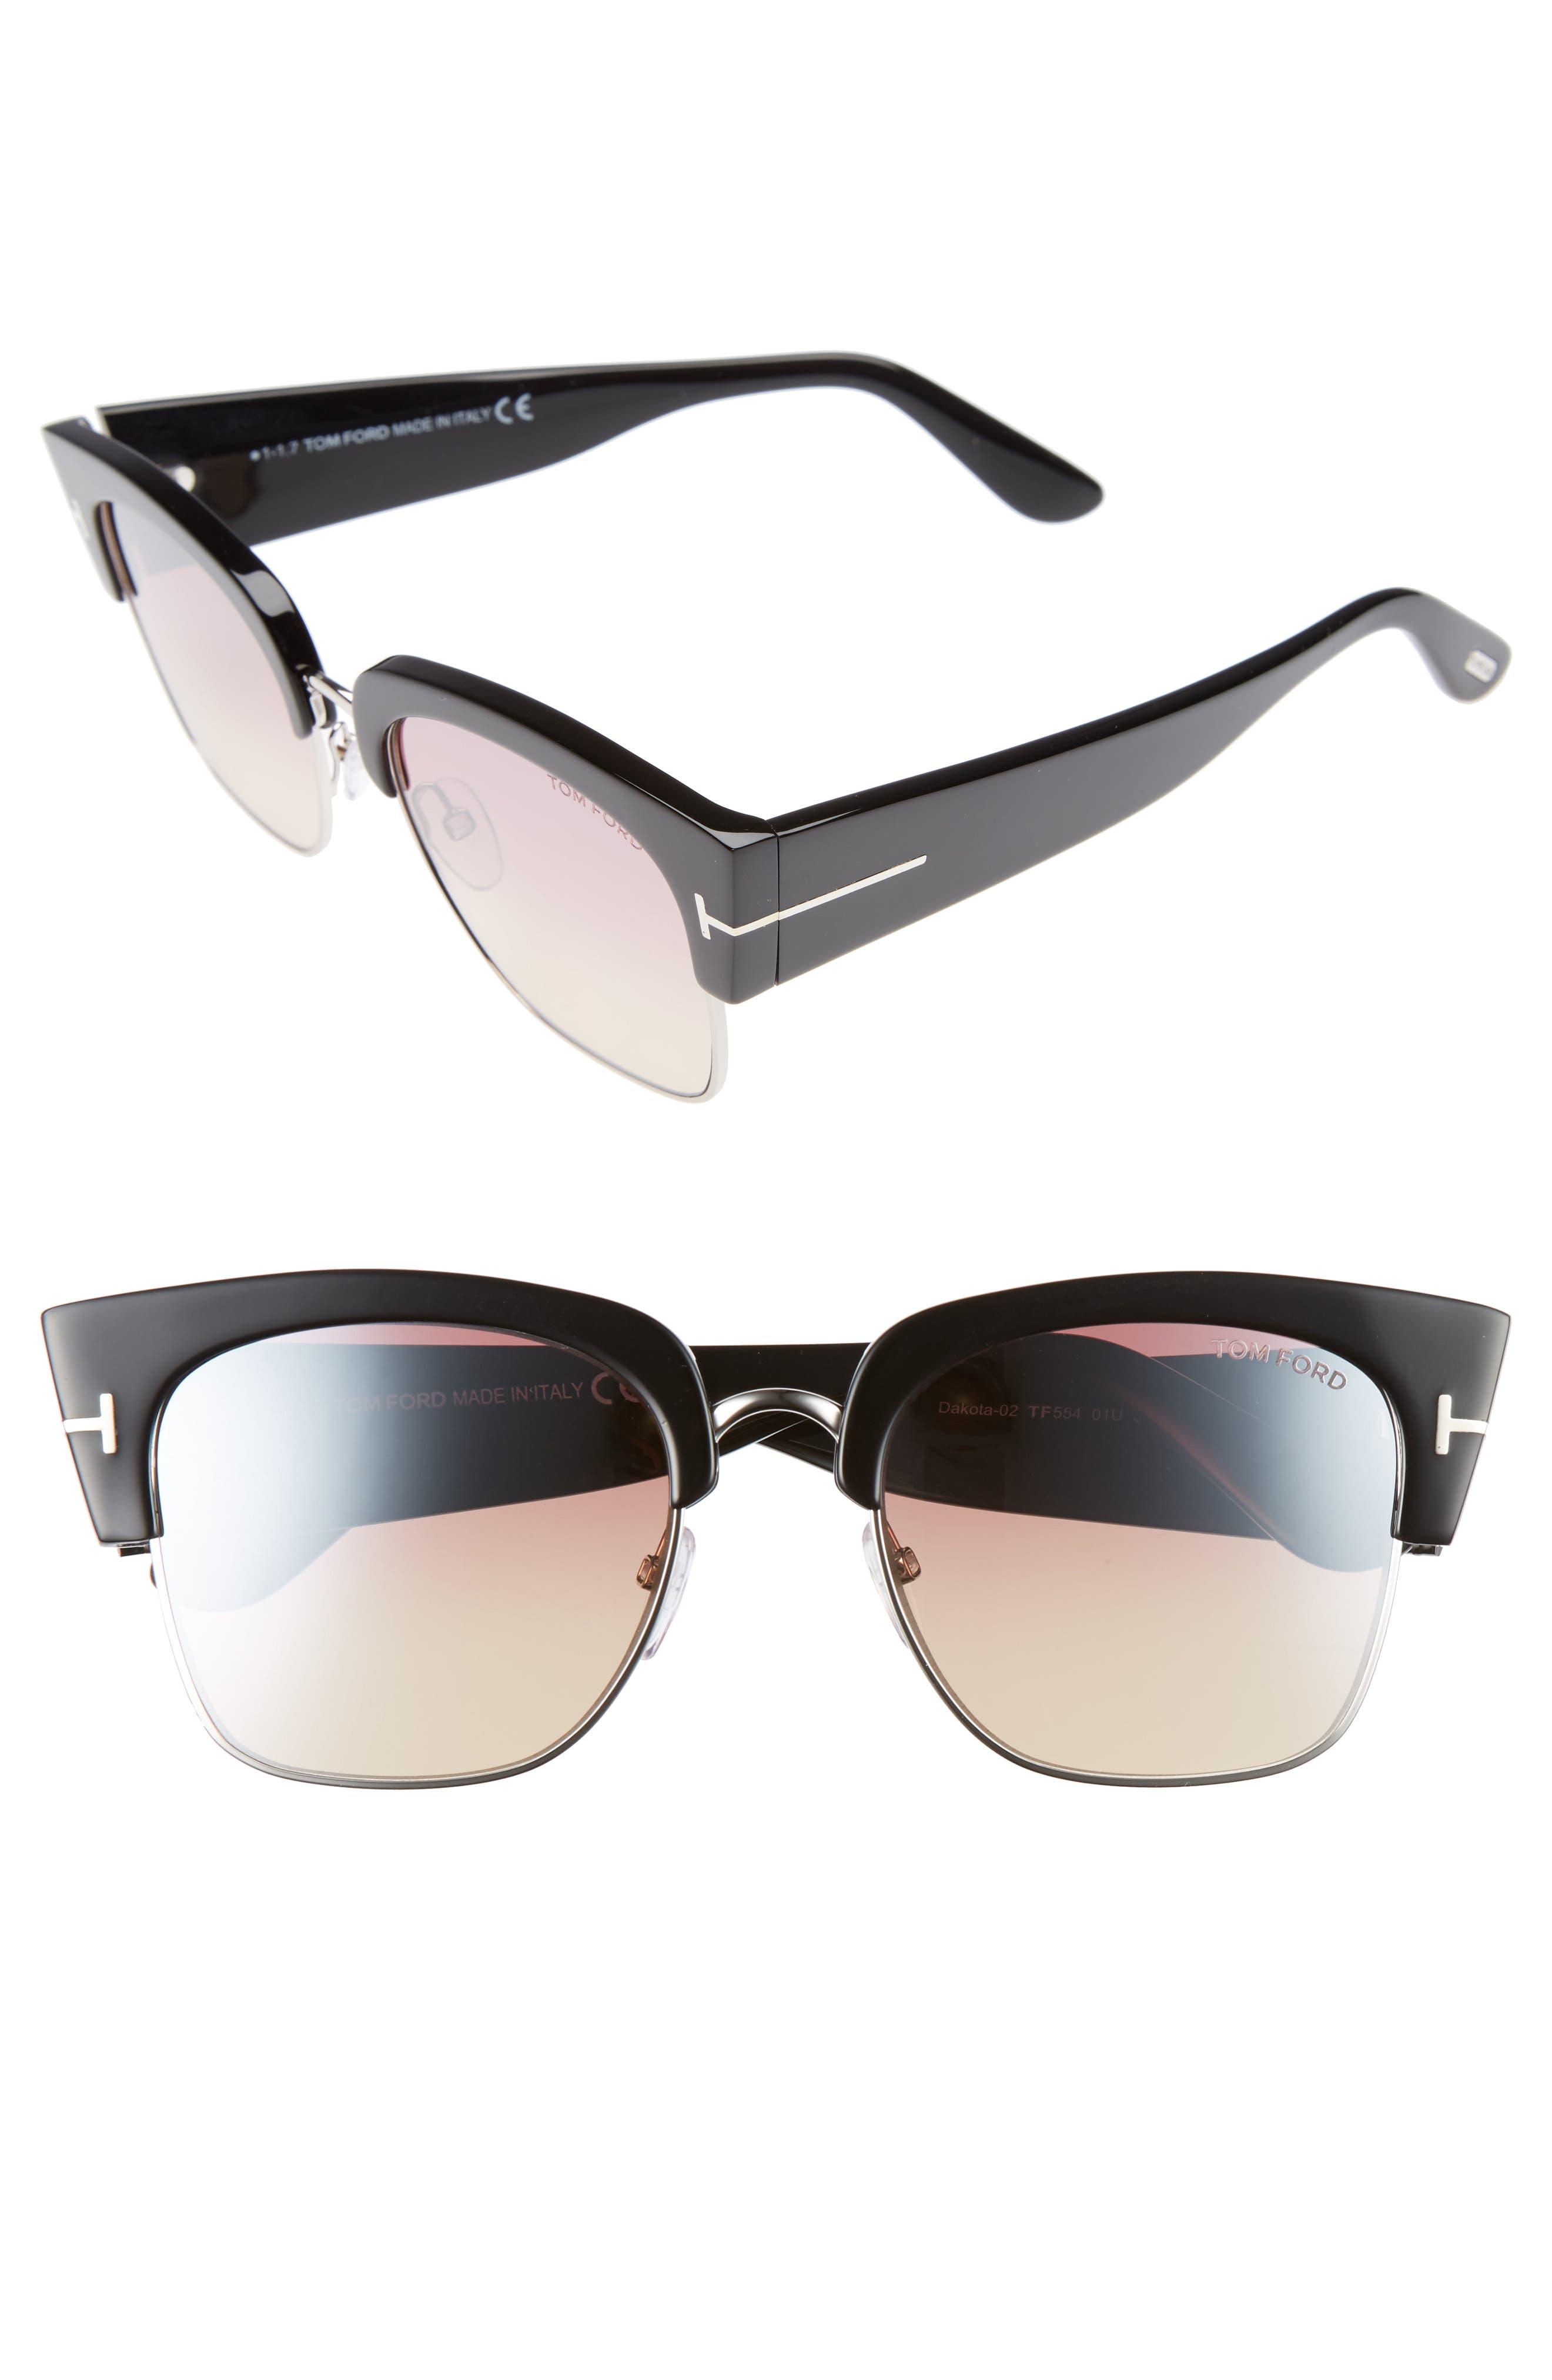 Alternate Image 1 Selected - Tom Ford Dakota 55mm Gradient Square Sunglasses